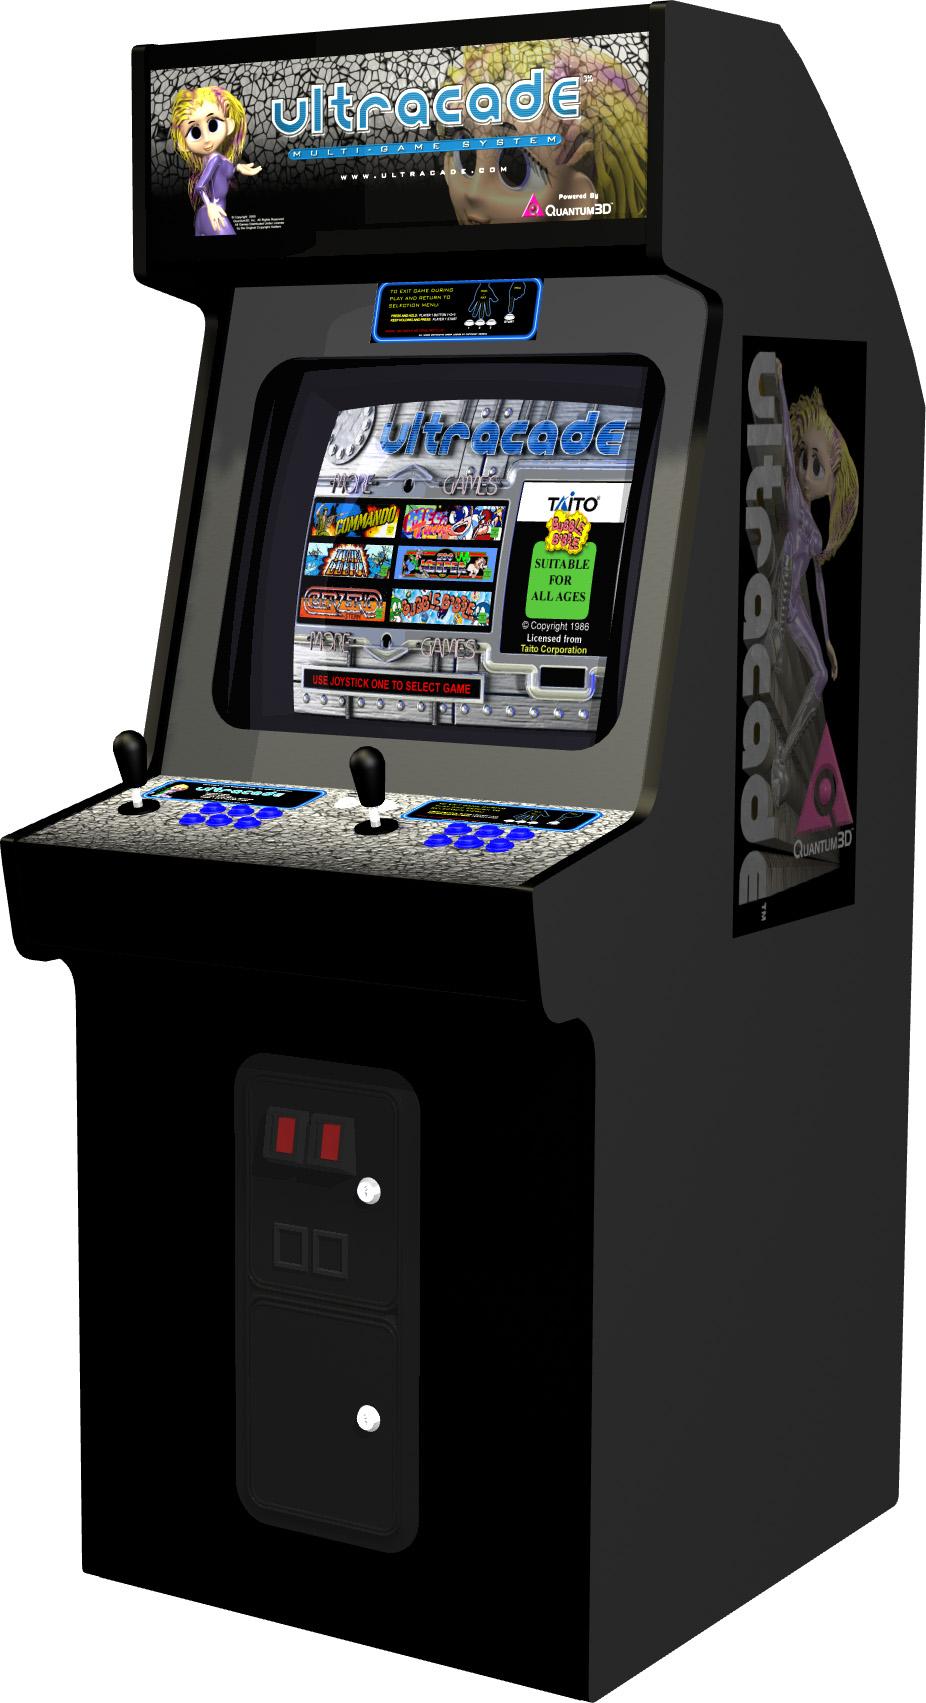 Ultracade Videogame By Hyperware